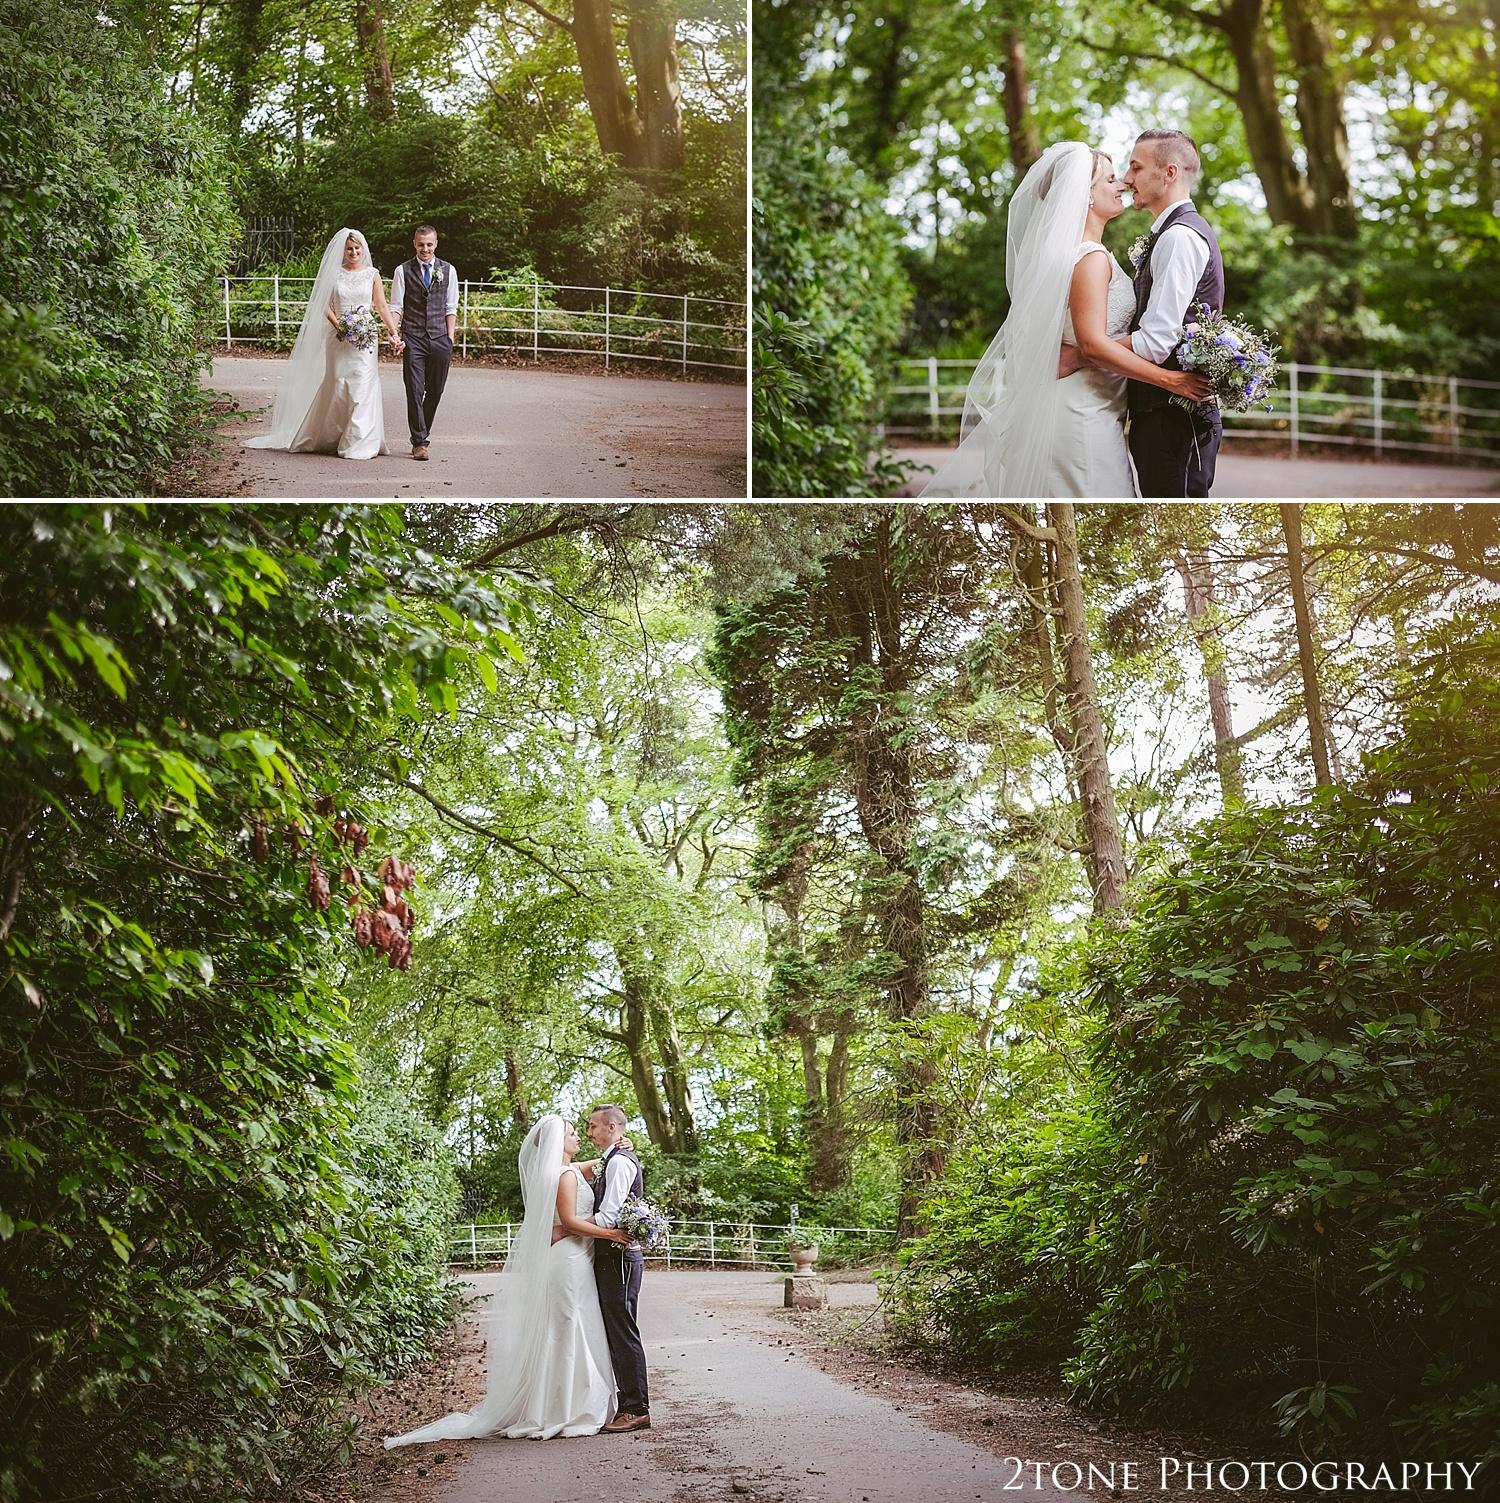 Wedding photographs in the woods.  Wedding photography at Guyzance Hall by wedding photographers www.2tonephotography.co.uk